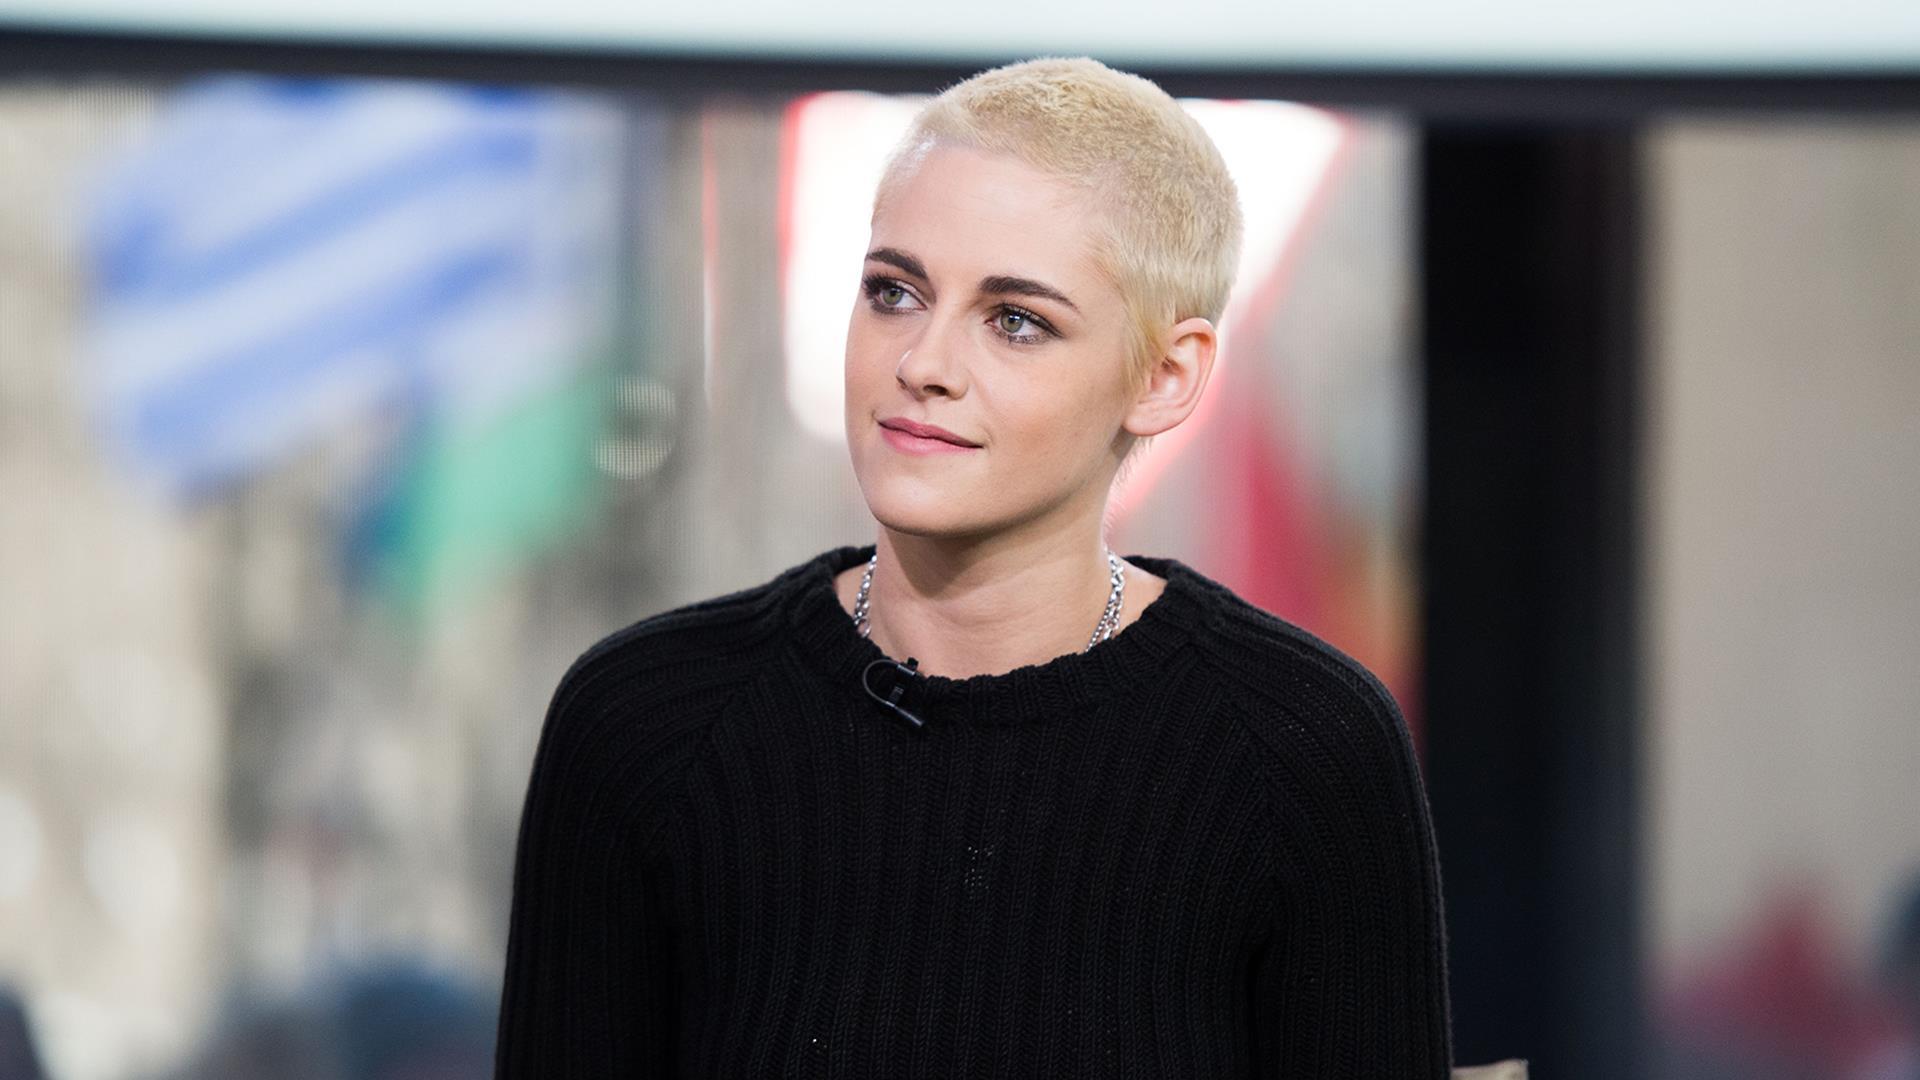 kristen stewart on new film  u2018personal shopper u2019 and why she cut off her hair